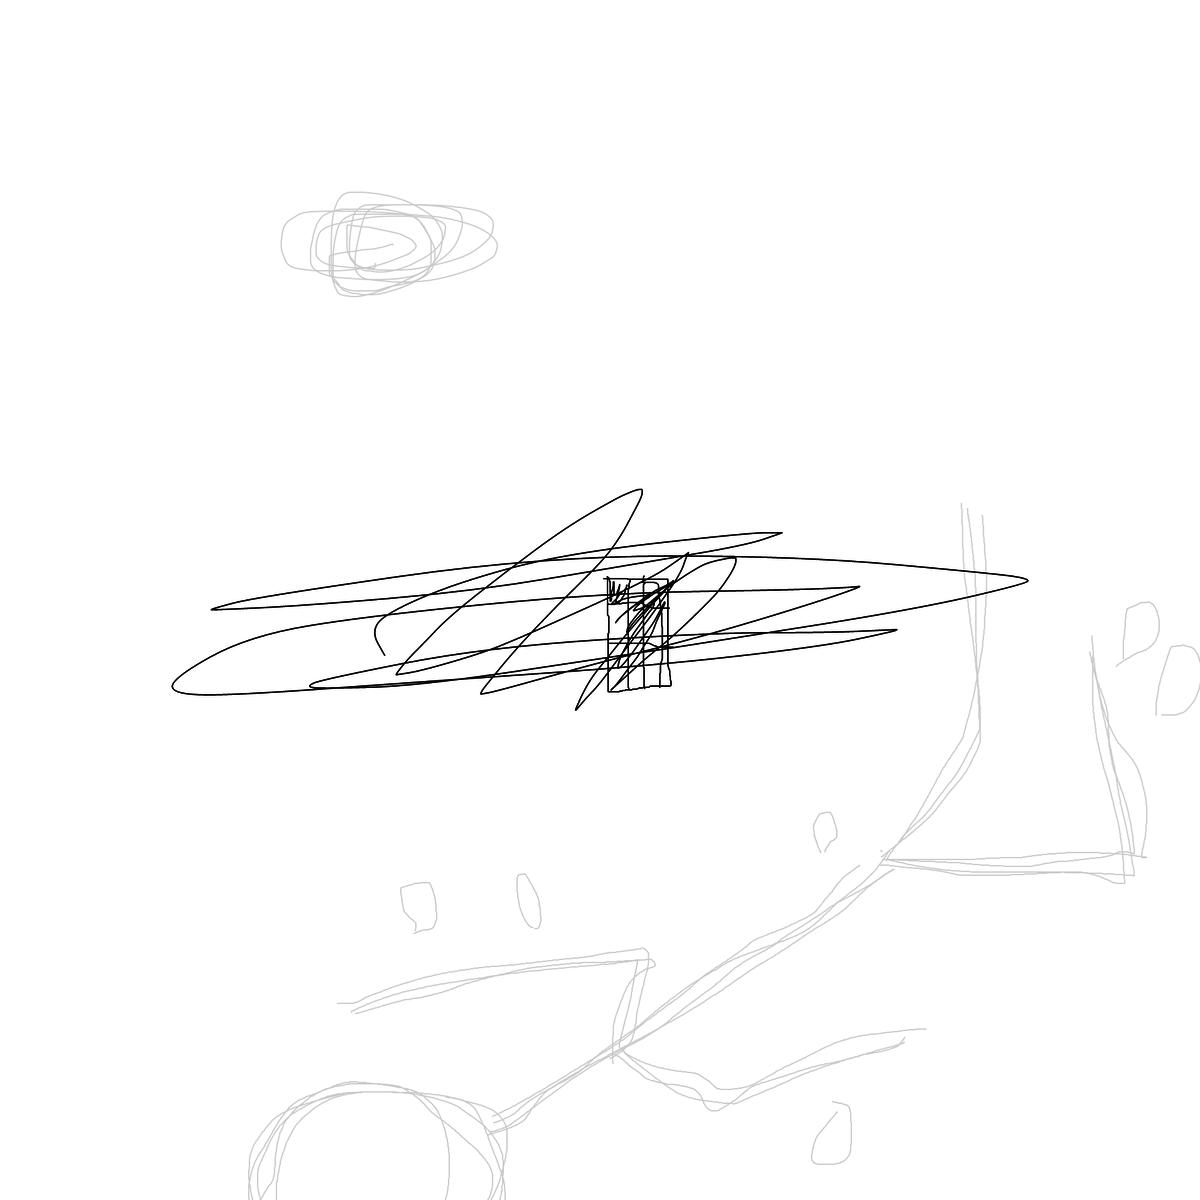 BAAAM drawing#18678 lat:45.5558471679687500lng: -73.6644287109375000